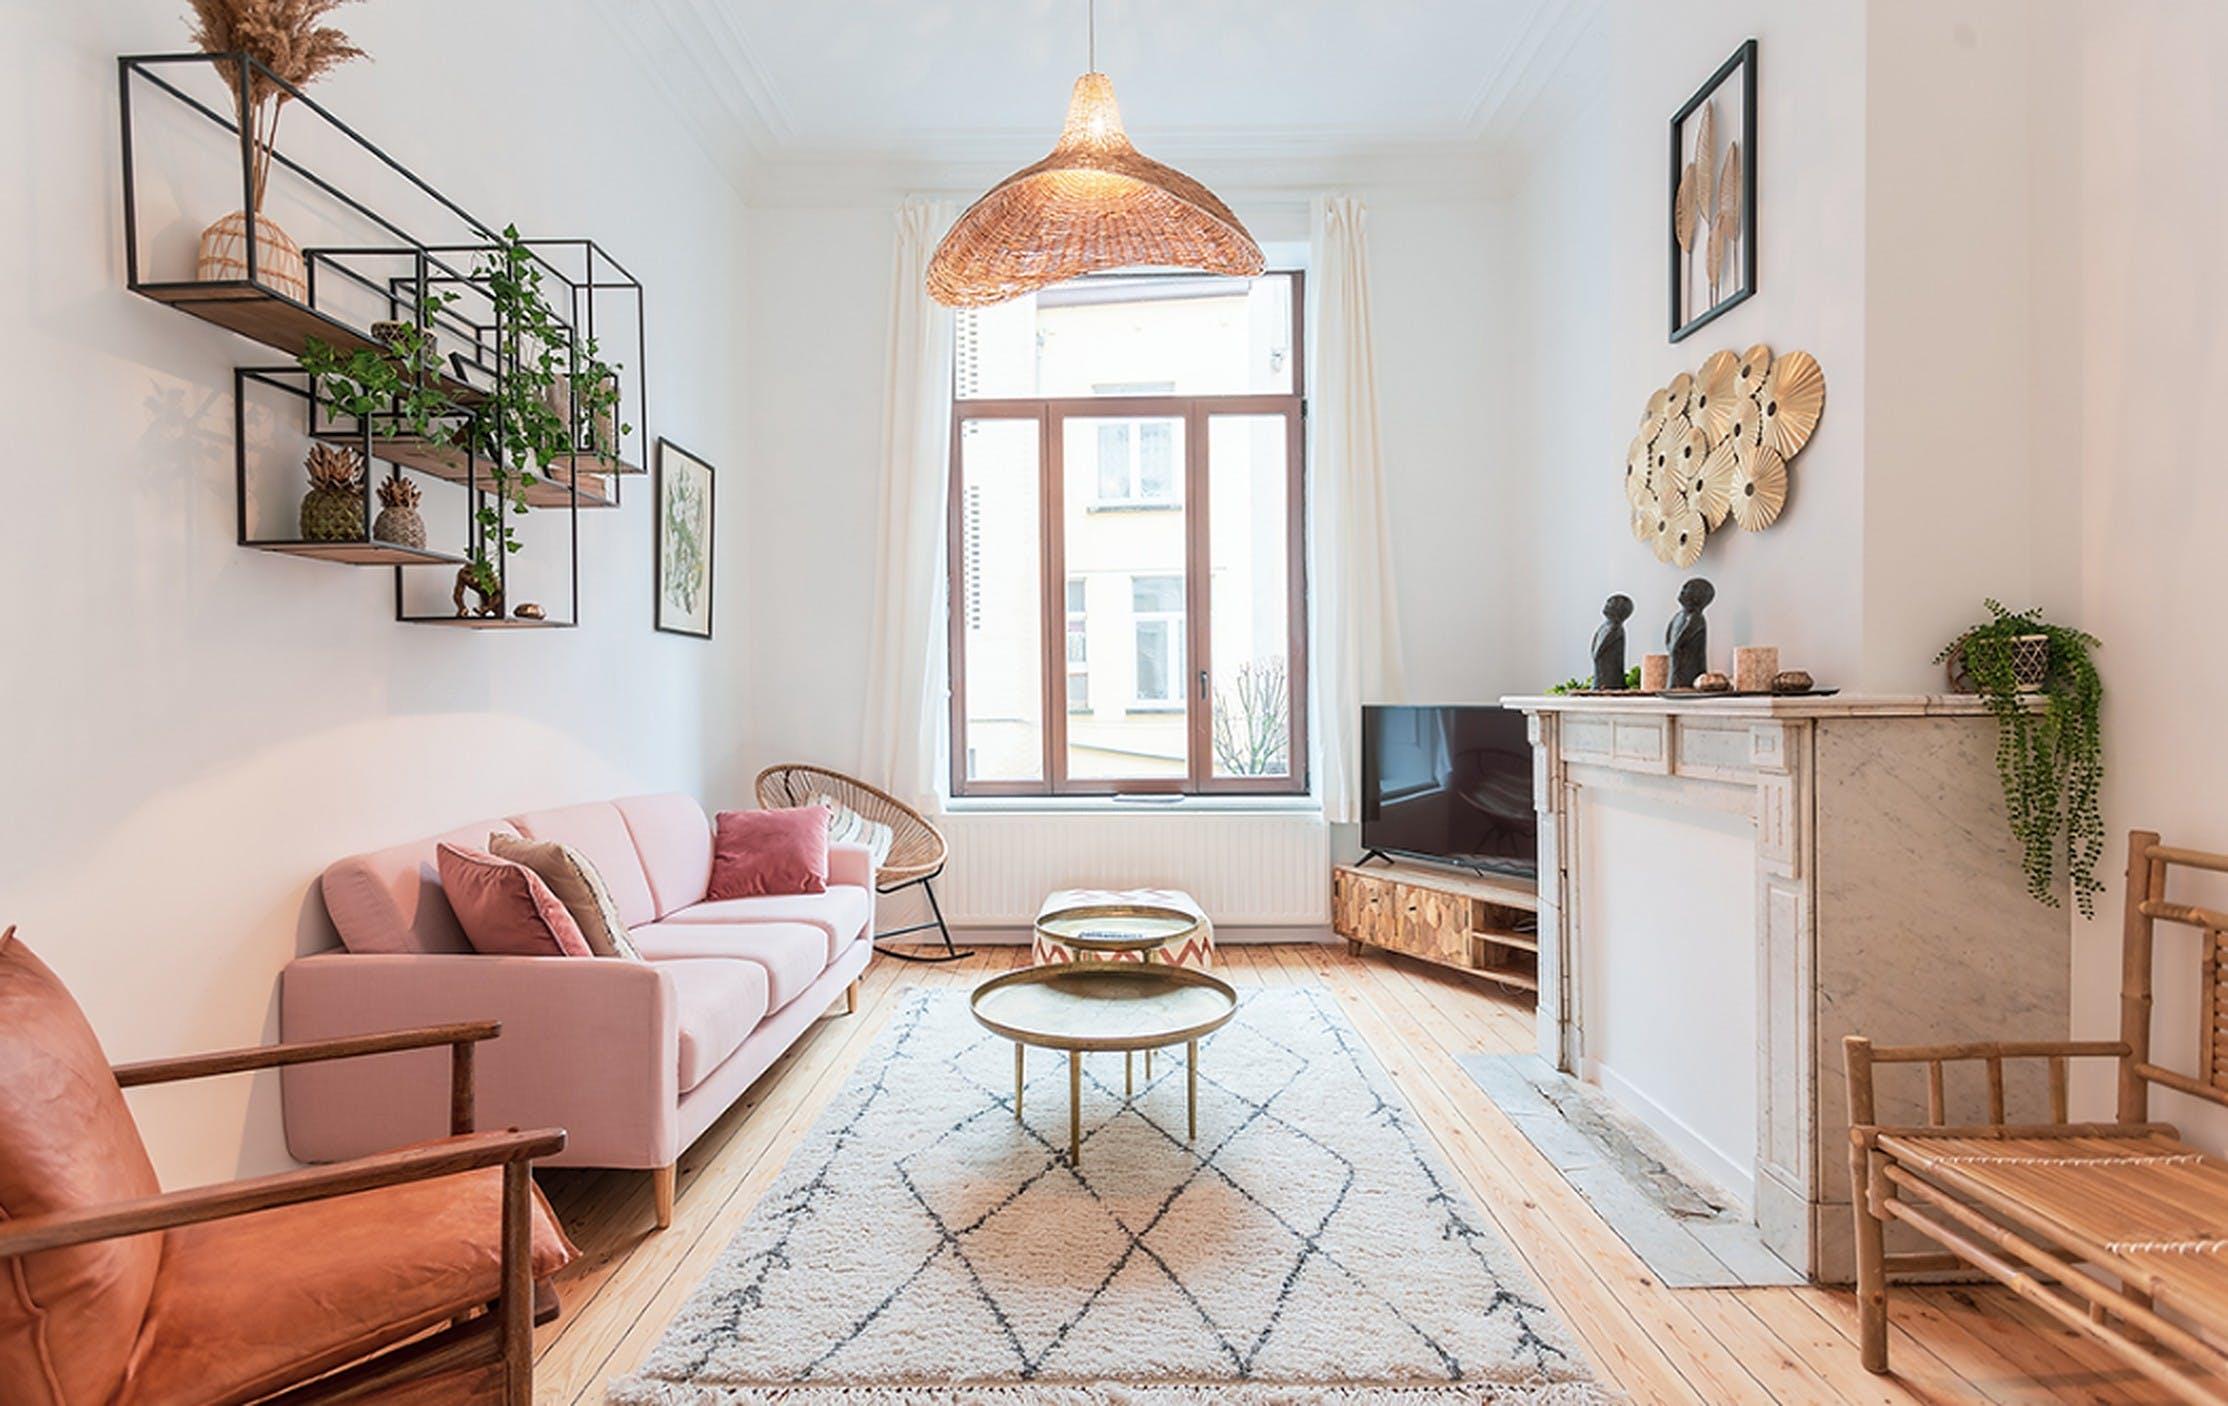 9 Residents | Ixelles | Cozy Spacious House w/ Backyard